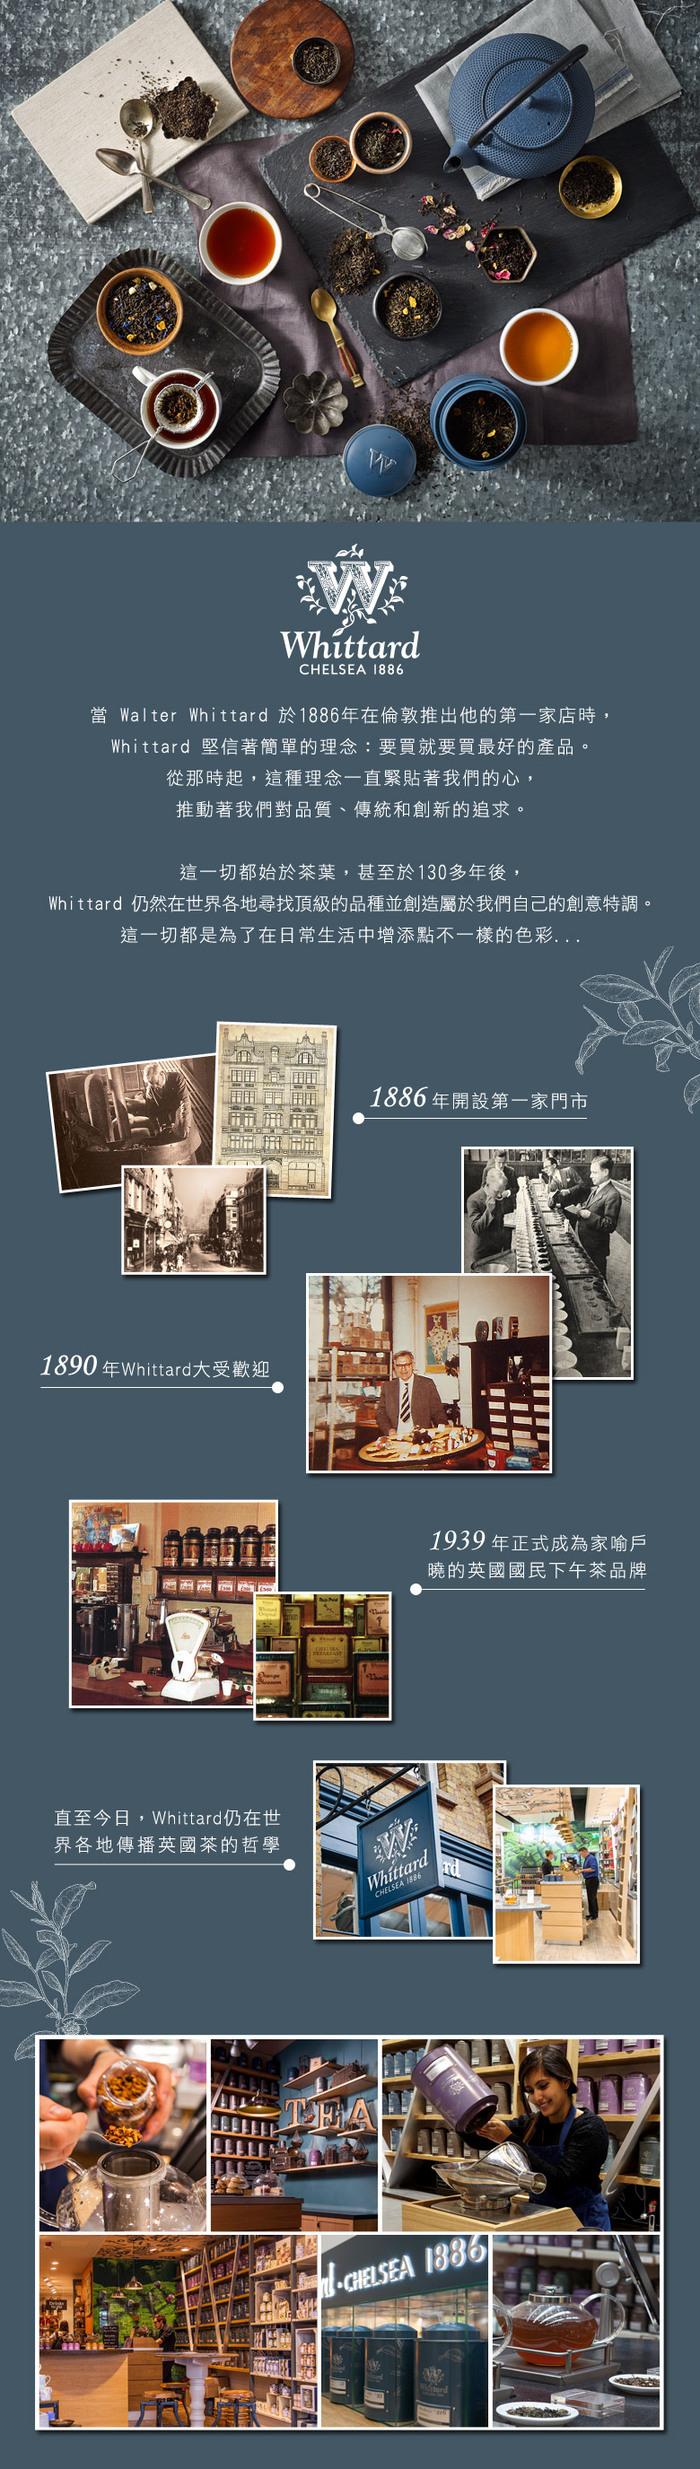 Whittard 靜心洋甘菊茶 Golden Camomile NO.80